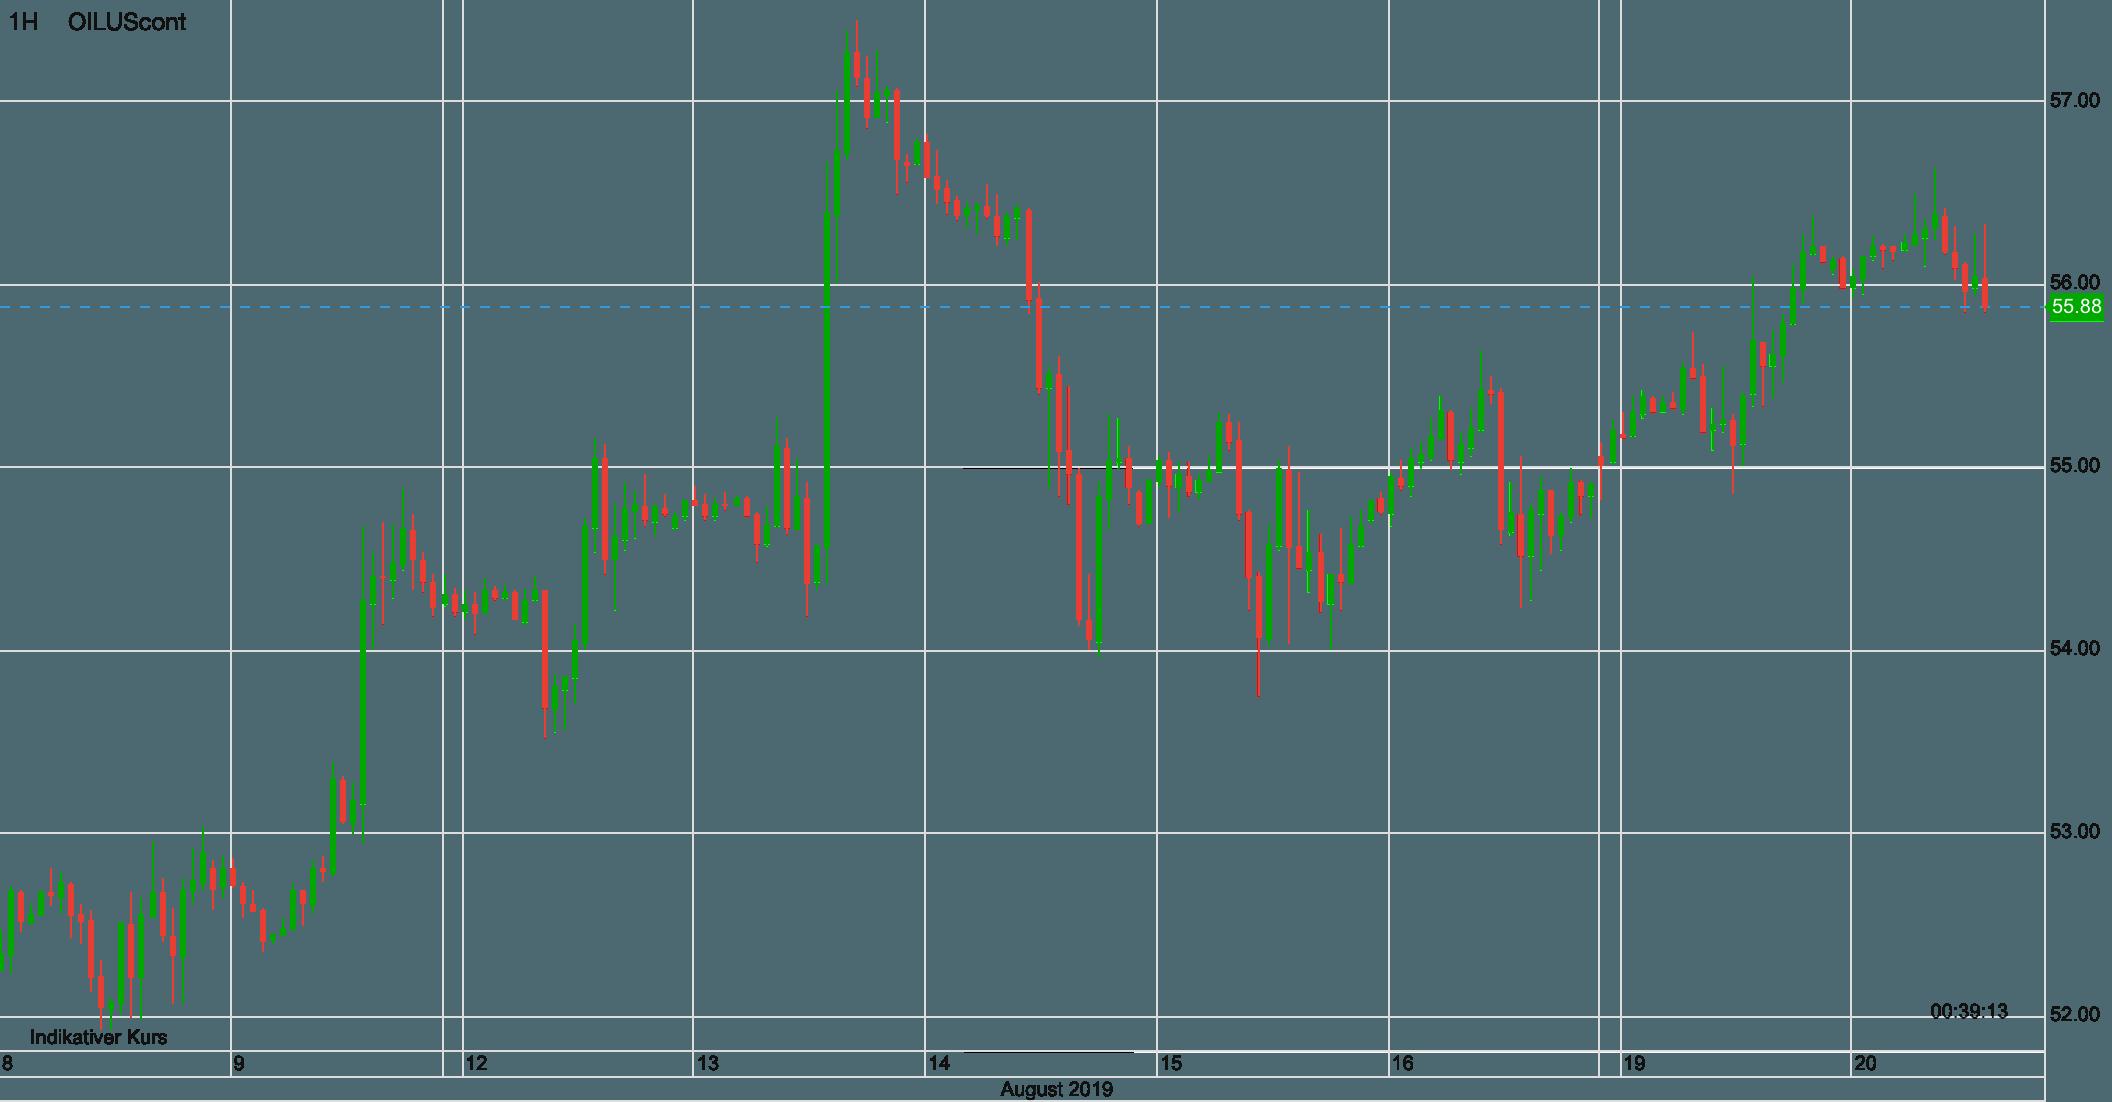 Ölpreis WTI seit 8. August